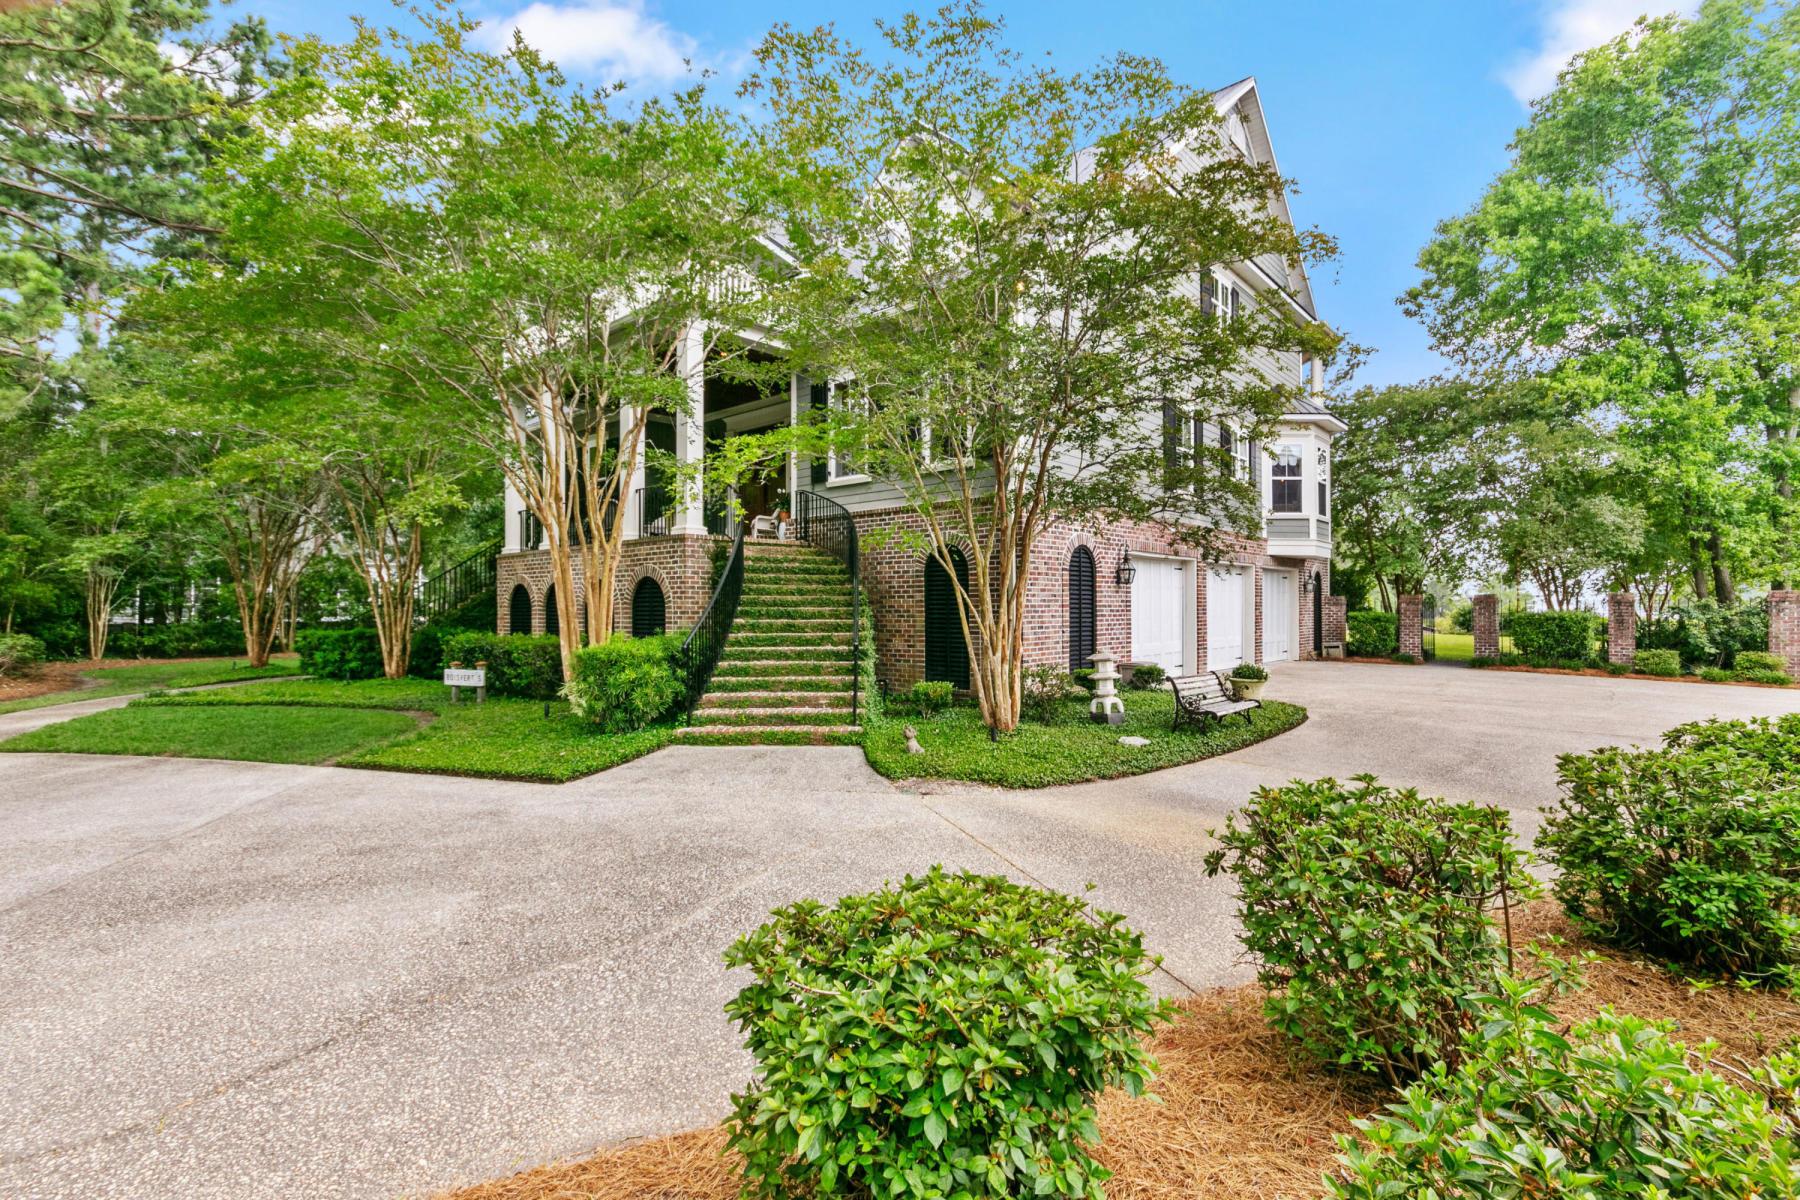 Broughton Hall Homes For Sale - 2058 Lakeshore, Pinopolis, SC - 79